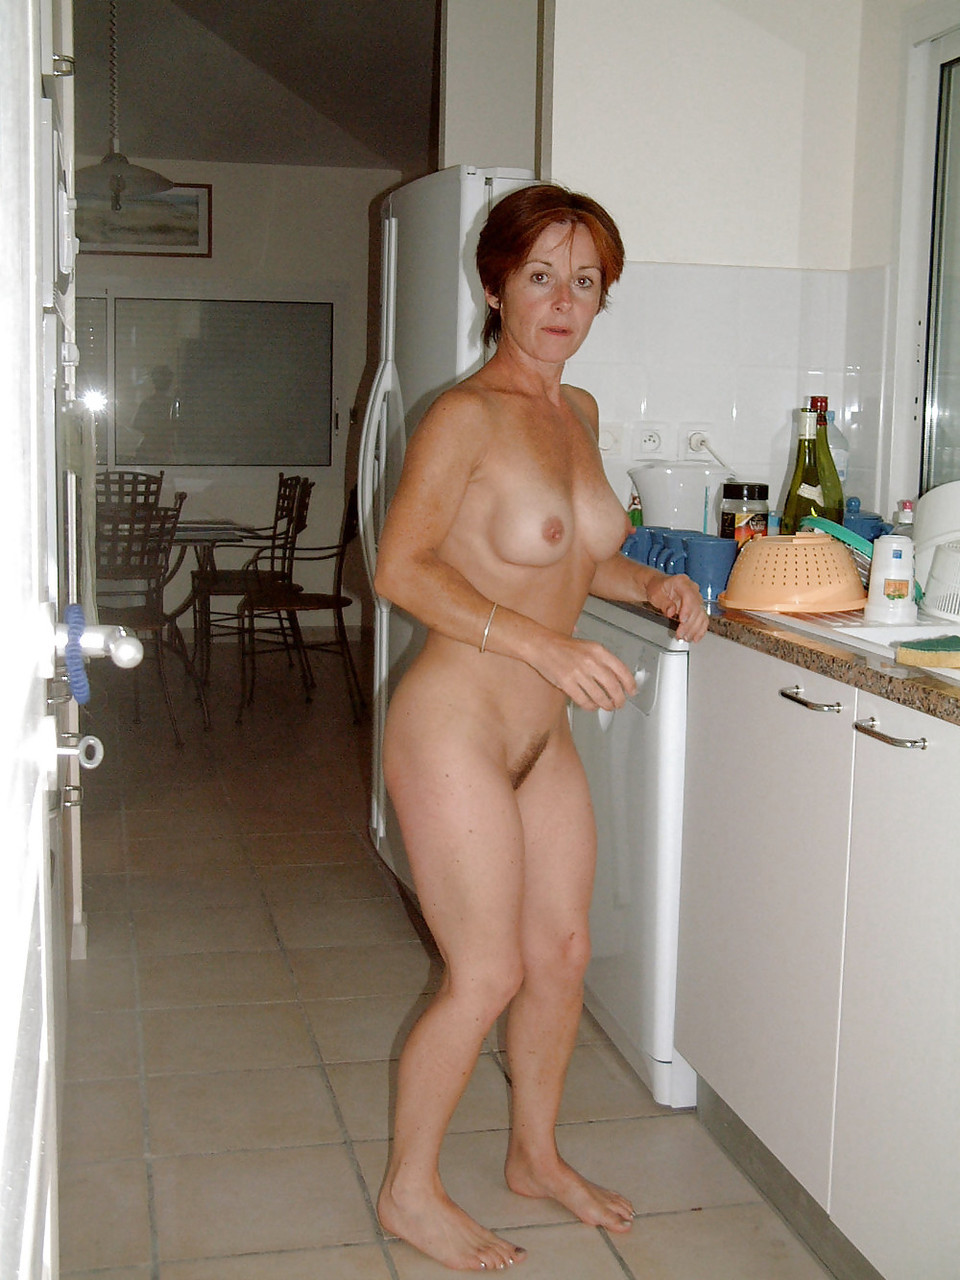 tumblr home nude